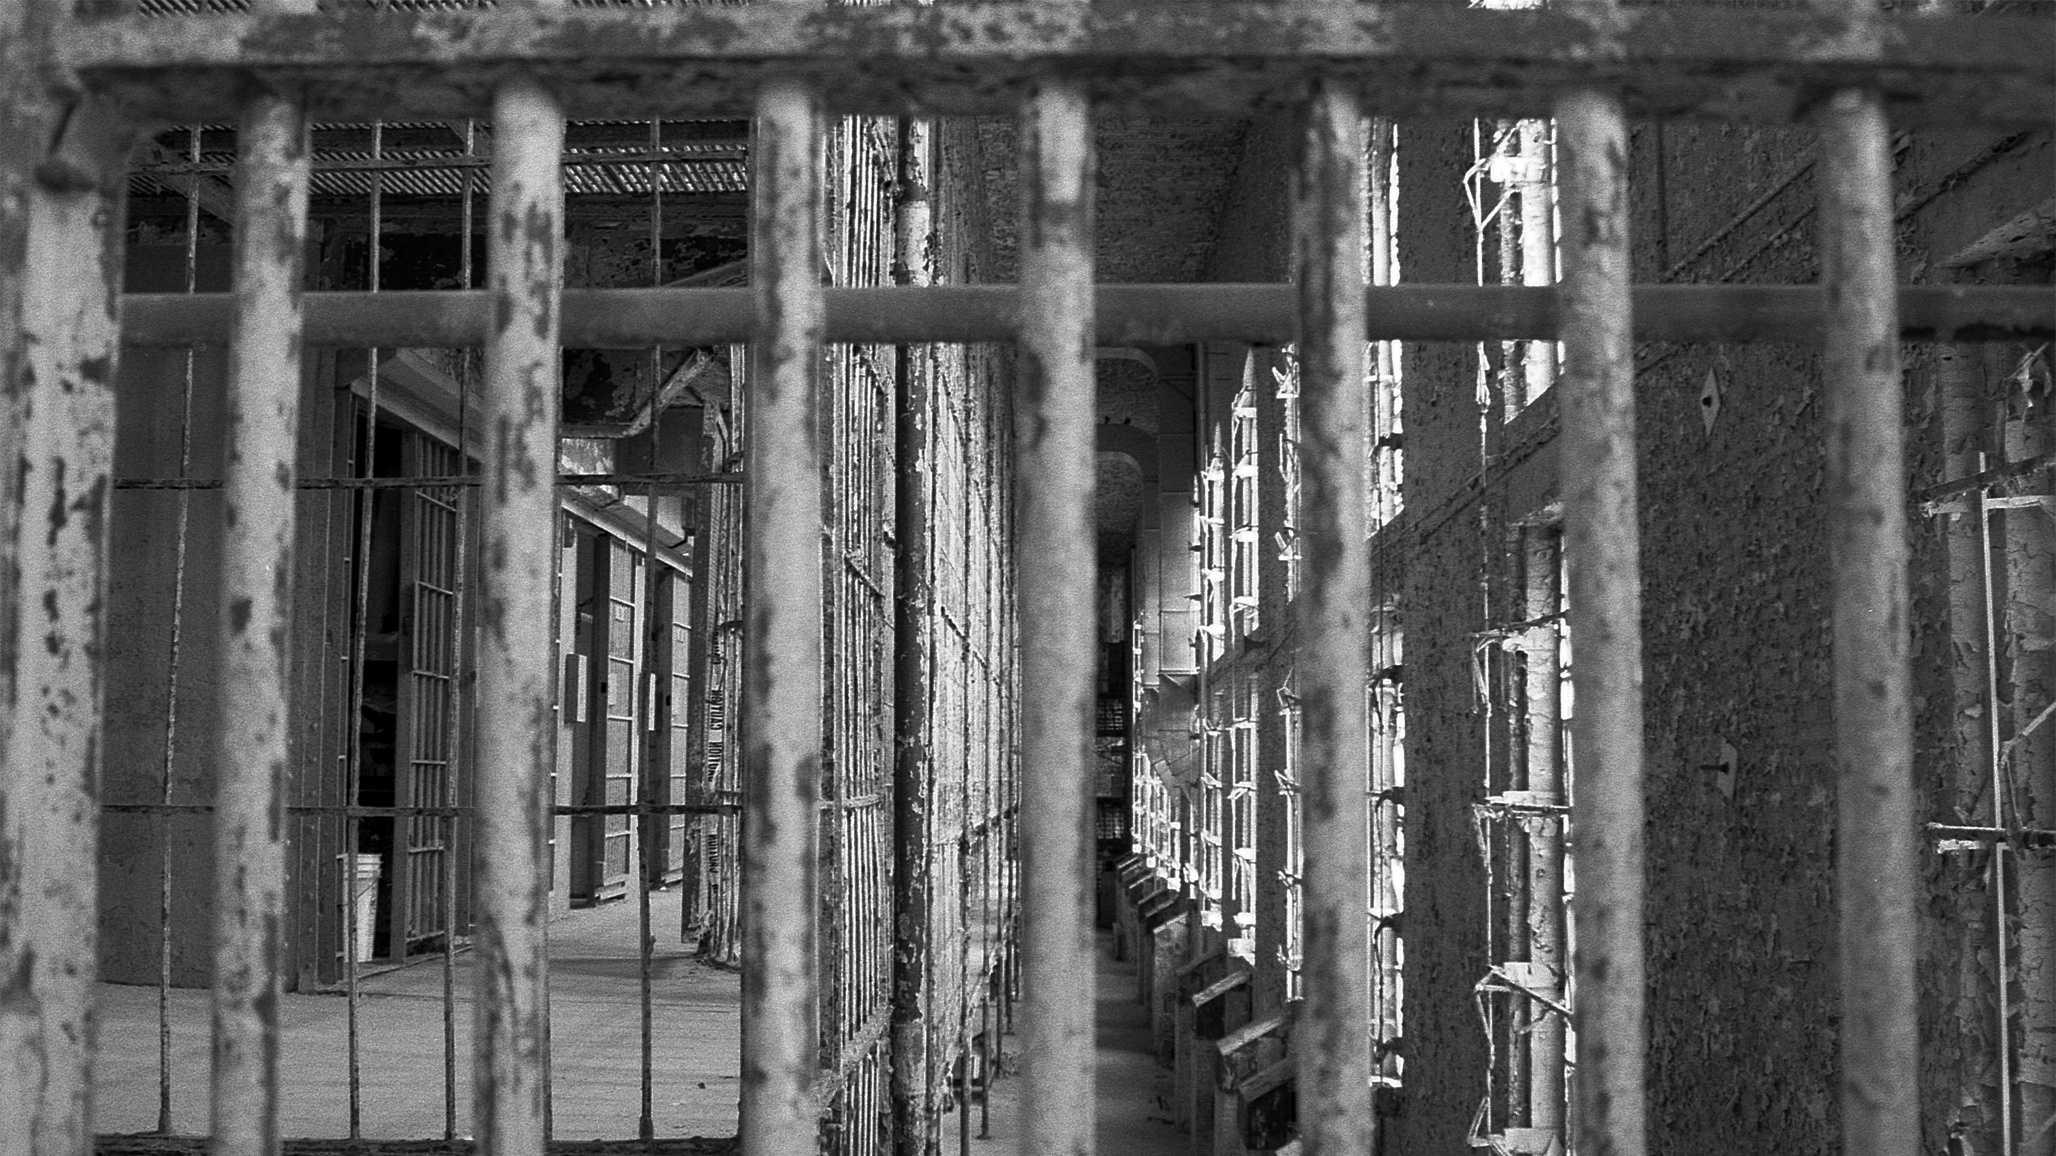 Prison generic 3.10